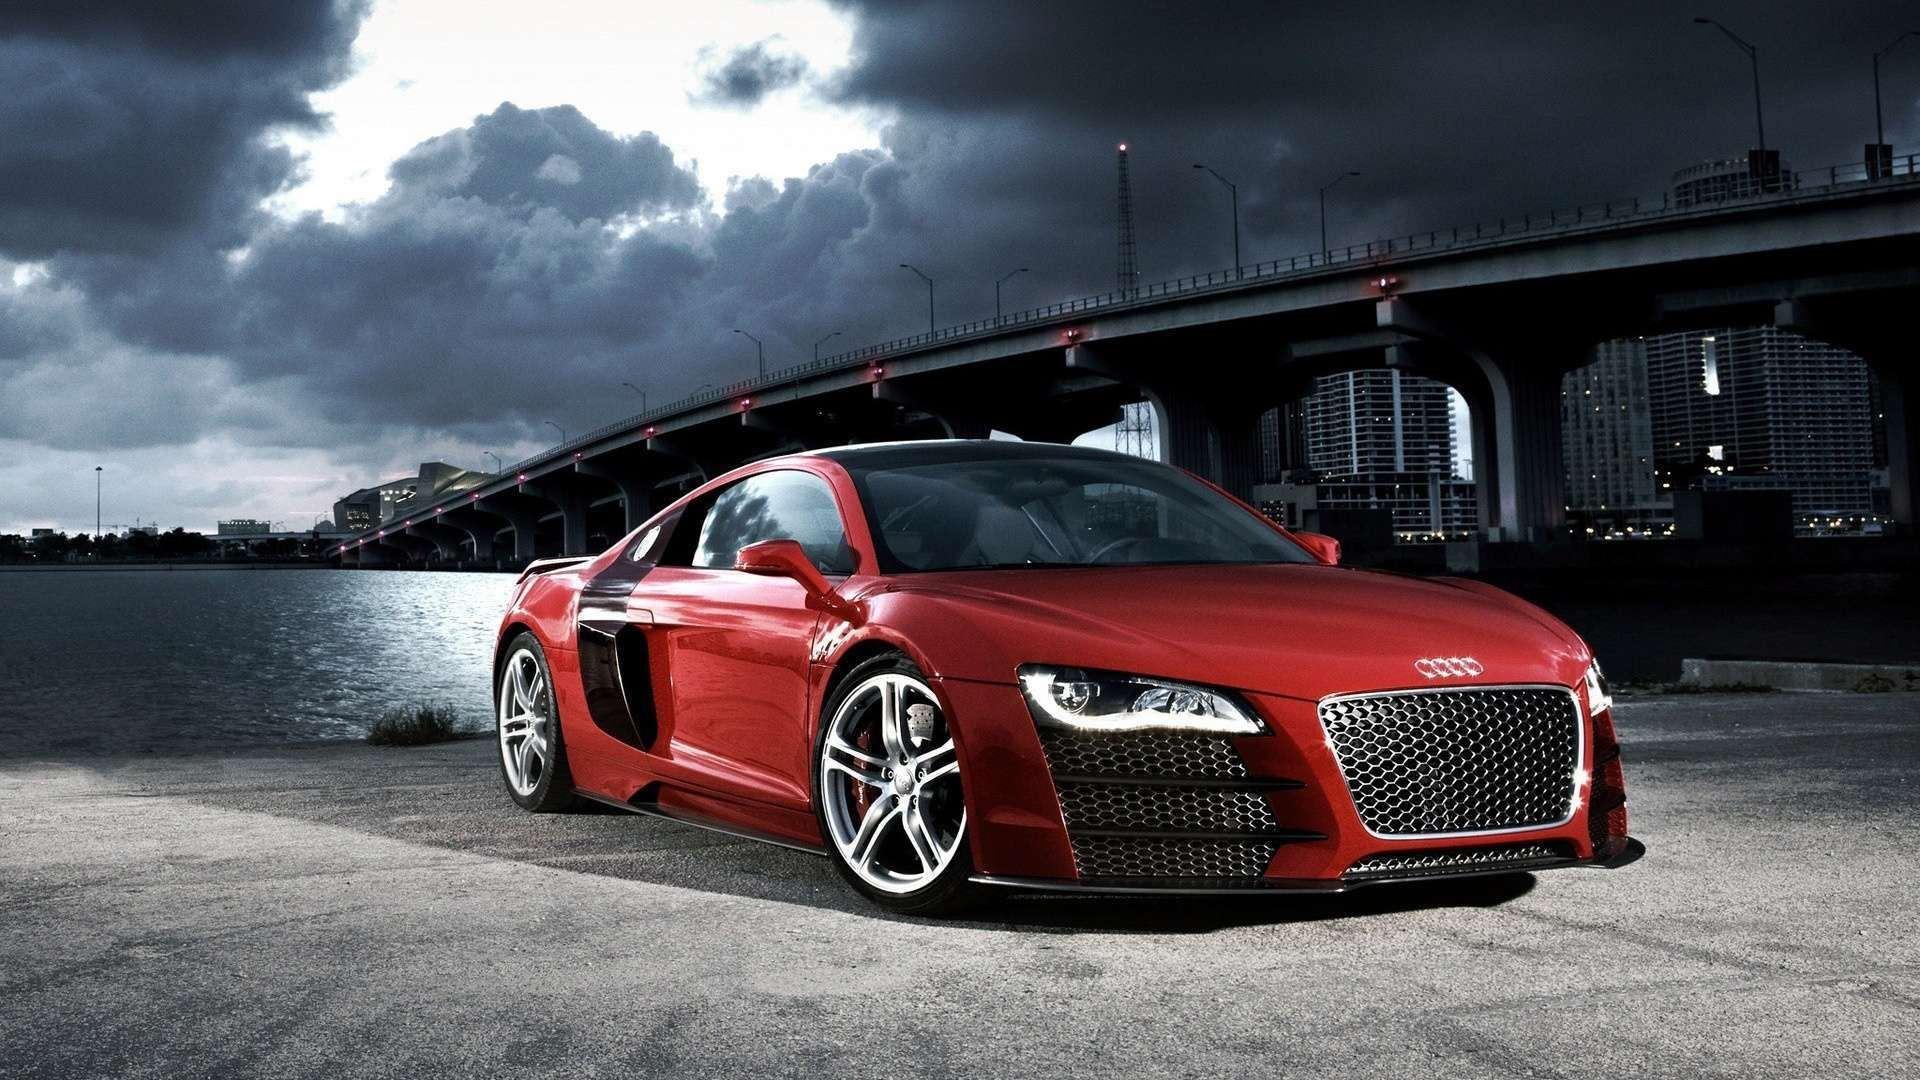 Hd Cars Wallpapers 1080p Wallpaper Cave Sports Car Wallpaper Hd Wallpapers Of Cars New Sports Cars